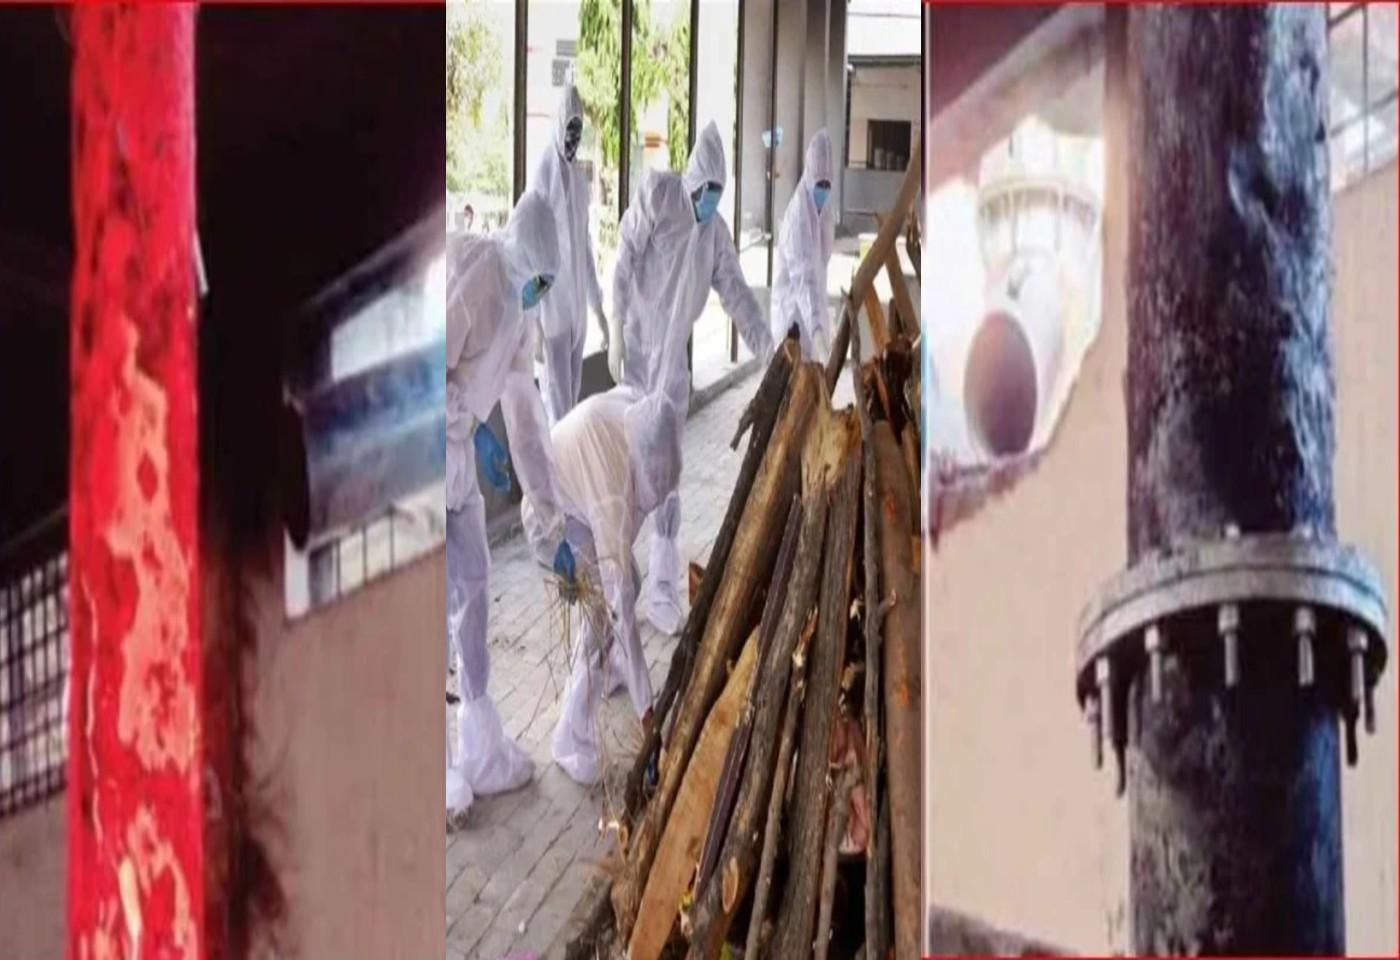 सुरतमध्ये कोरोनाचे थैमान, दररोज 100 हून अधिक अंत्यसंस्कार, विद्युतदाहिन्यांची धुरांडीही वितळली । Corona in Surat, more than 100 funerals a day, Chimenys of electric crematorium melted